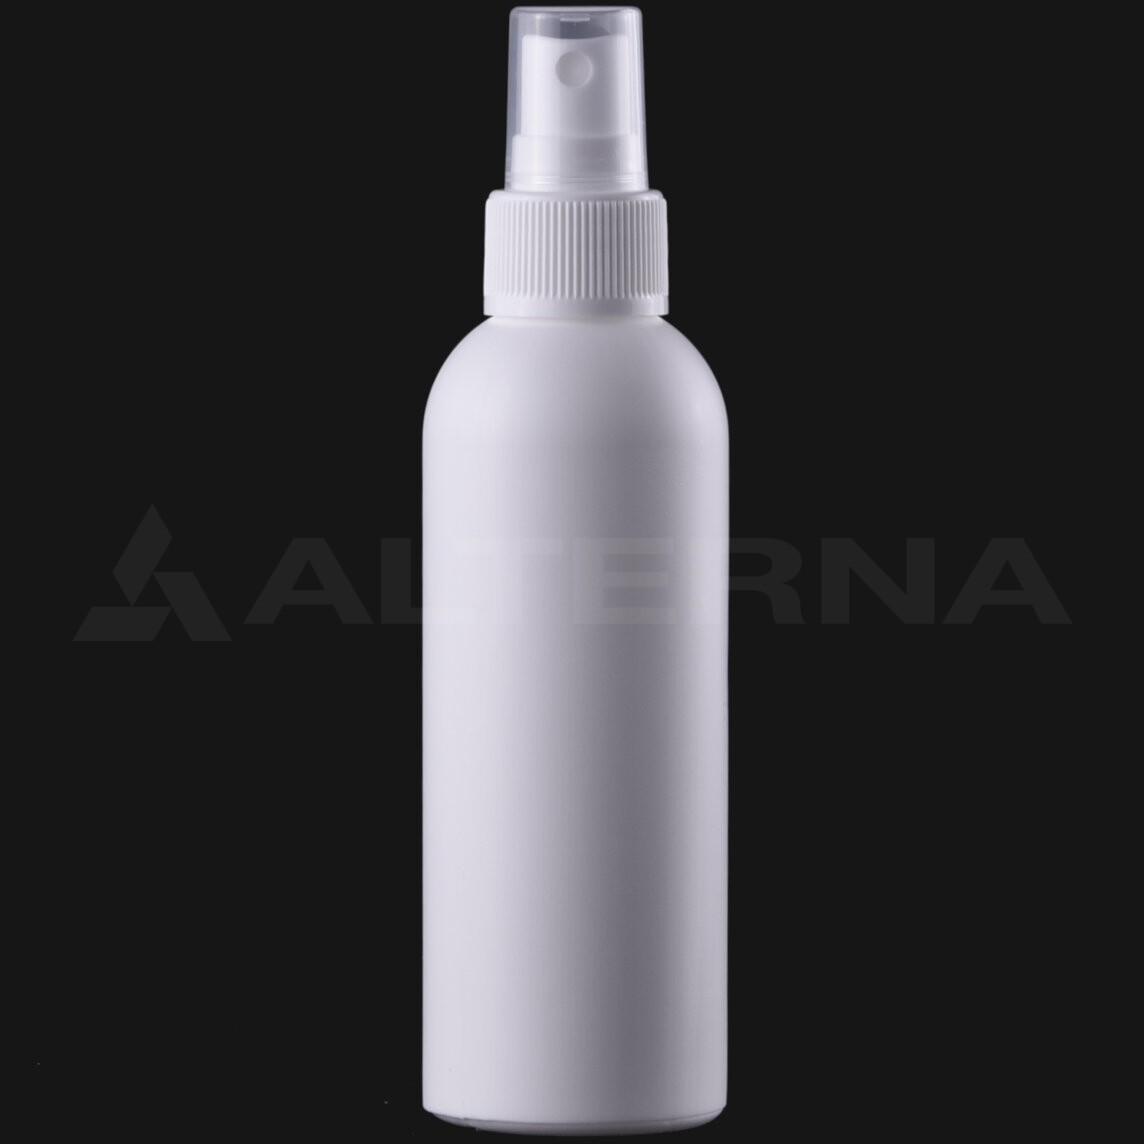 150 ml HDPE Bottle with 24 mm Sprayer